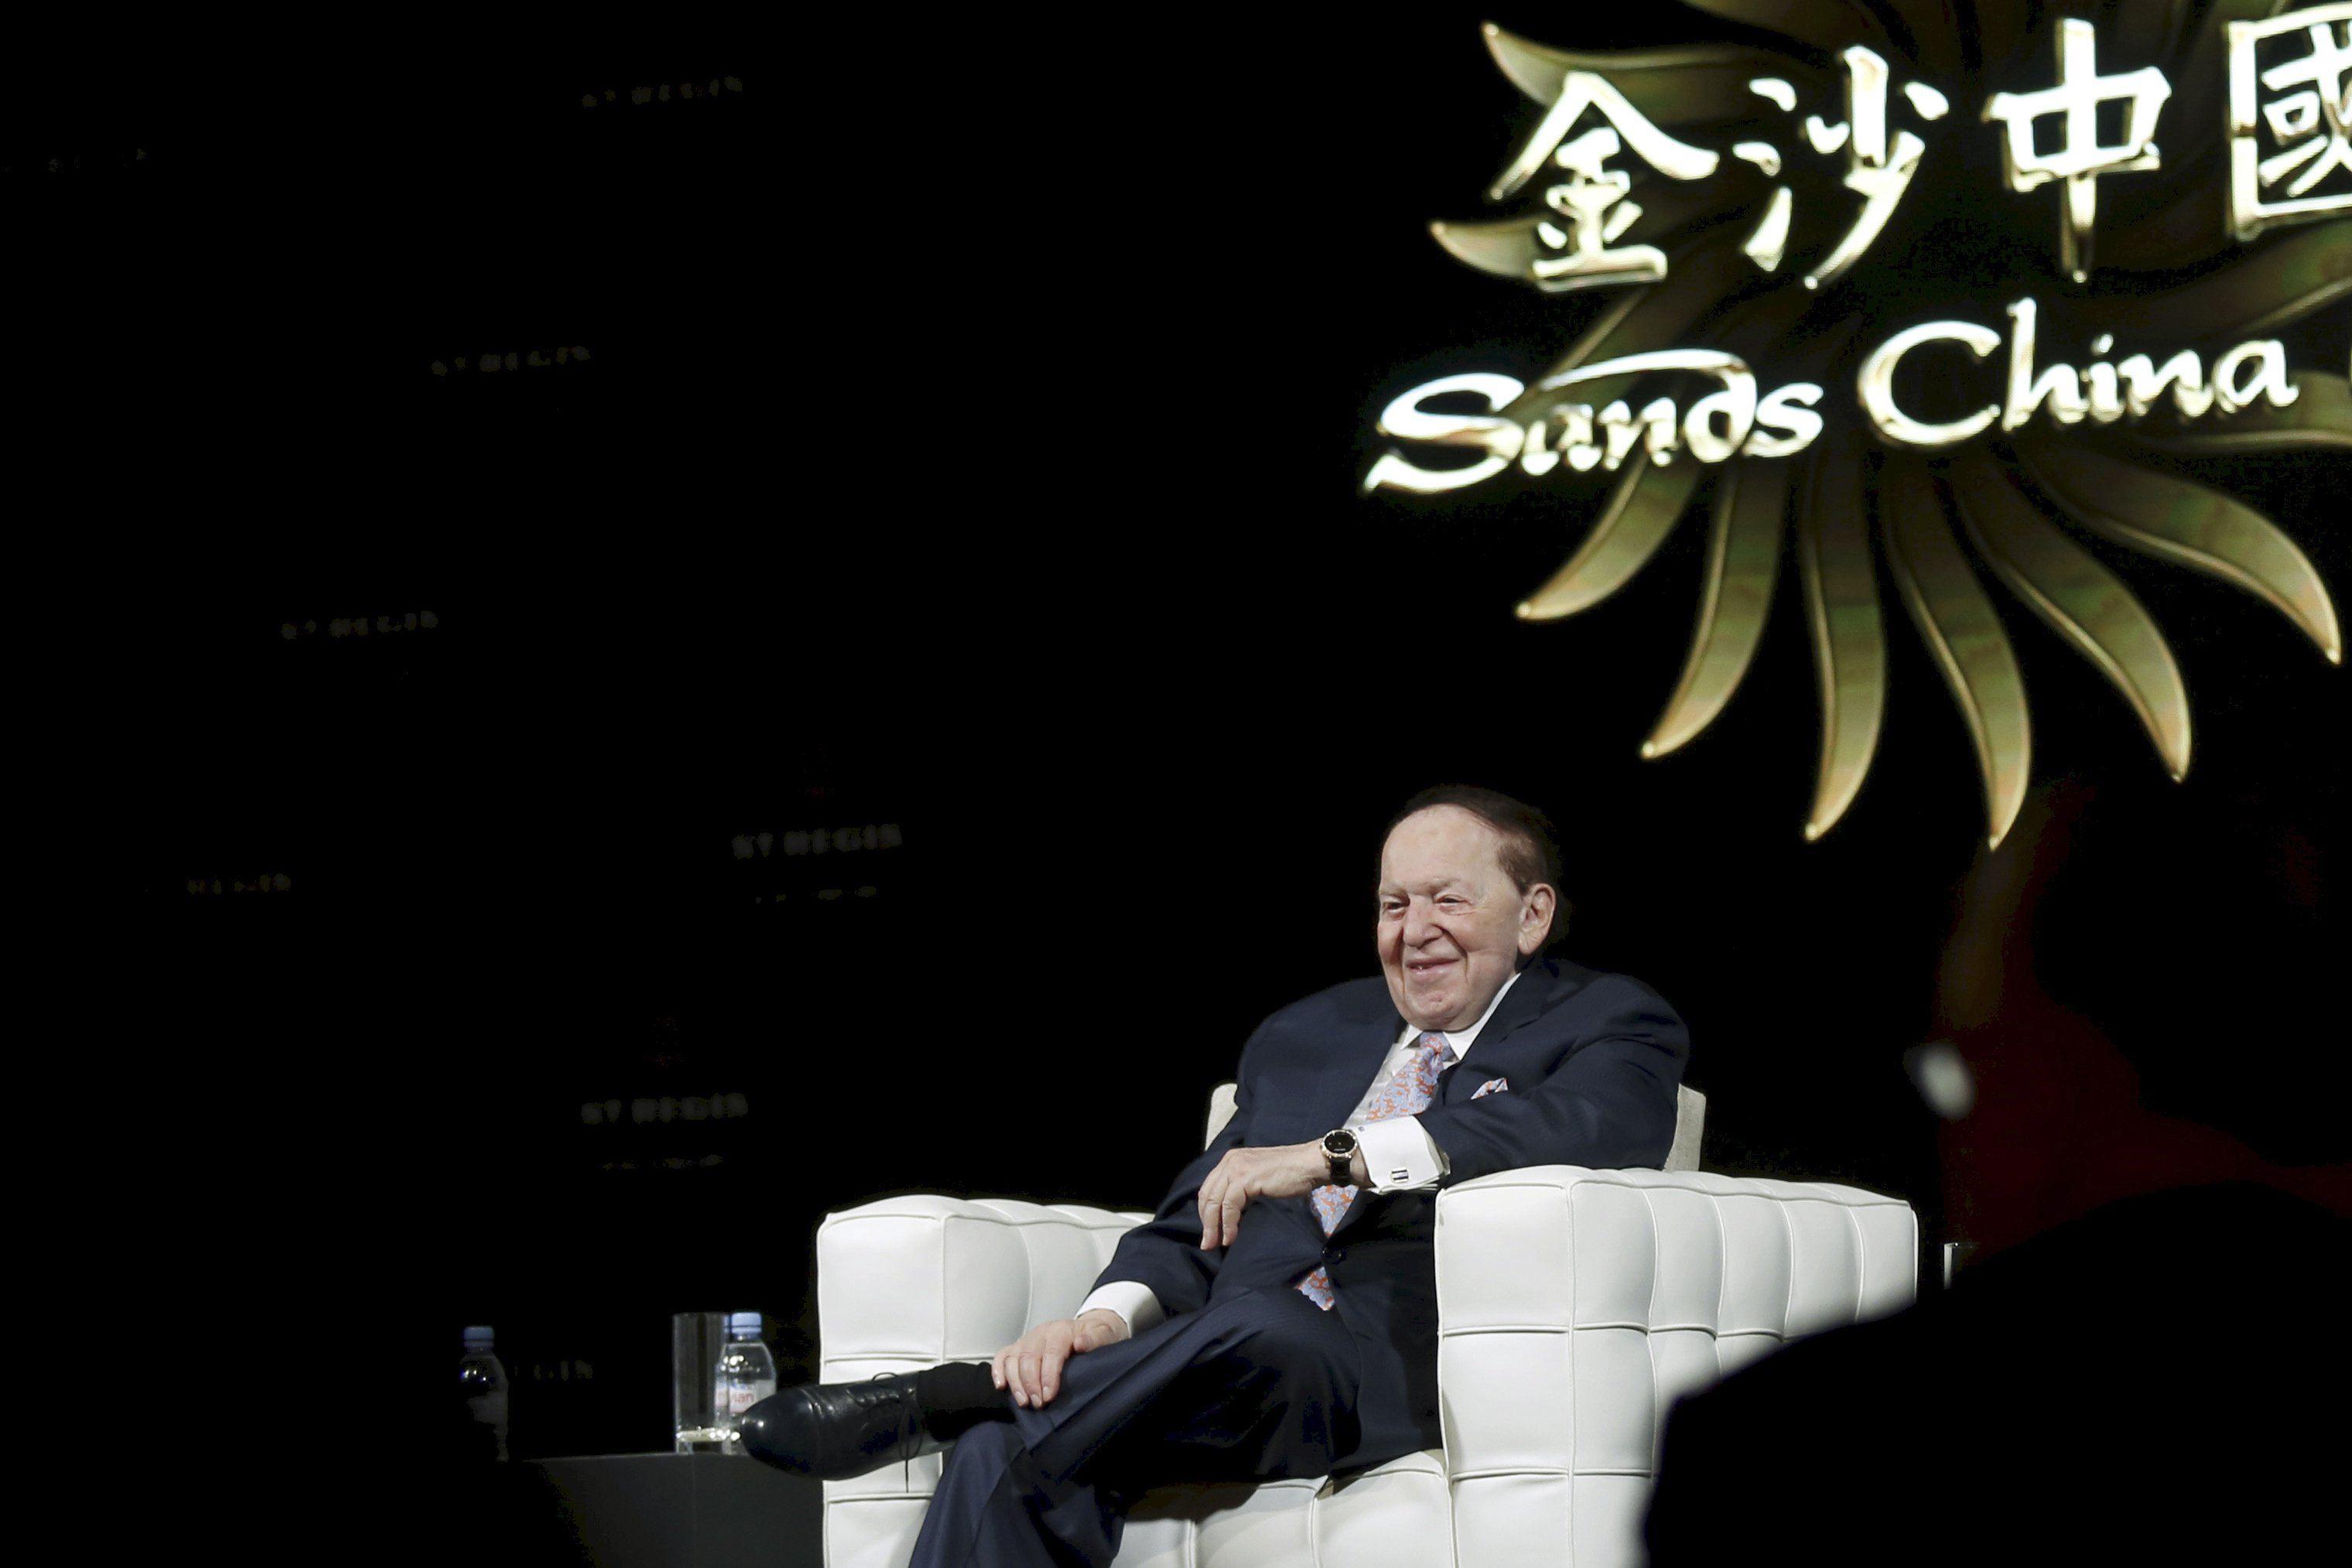 Las Vegas Sands Macau Sheldon Adelson